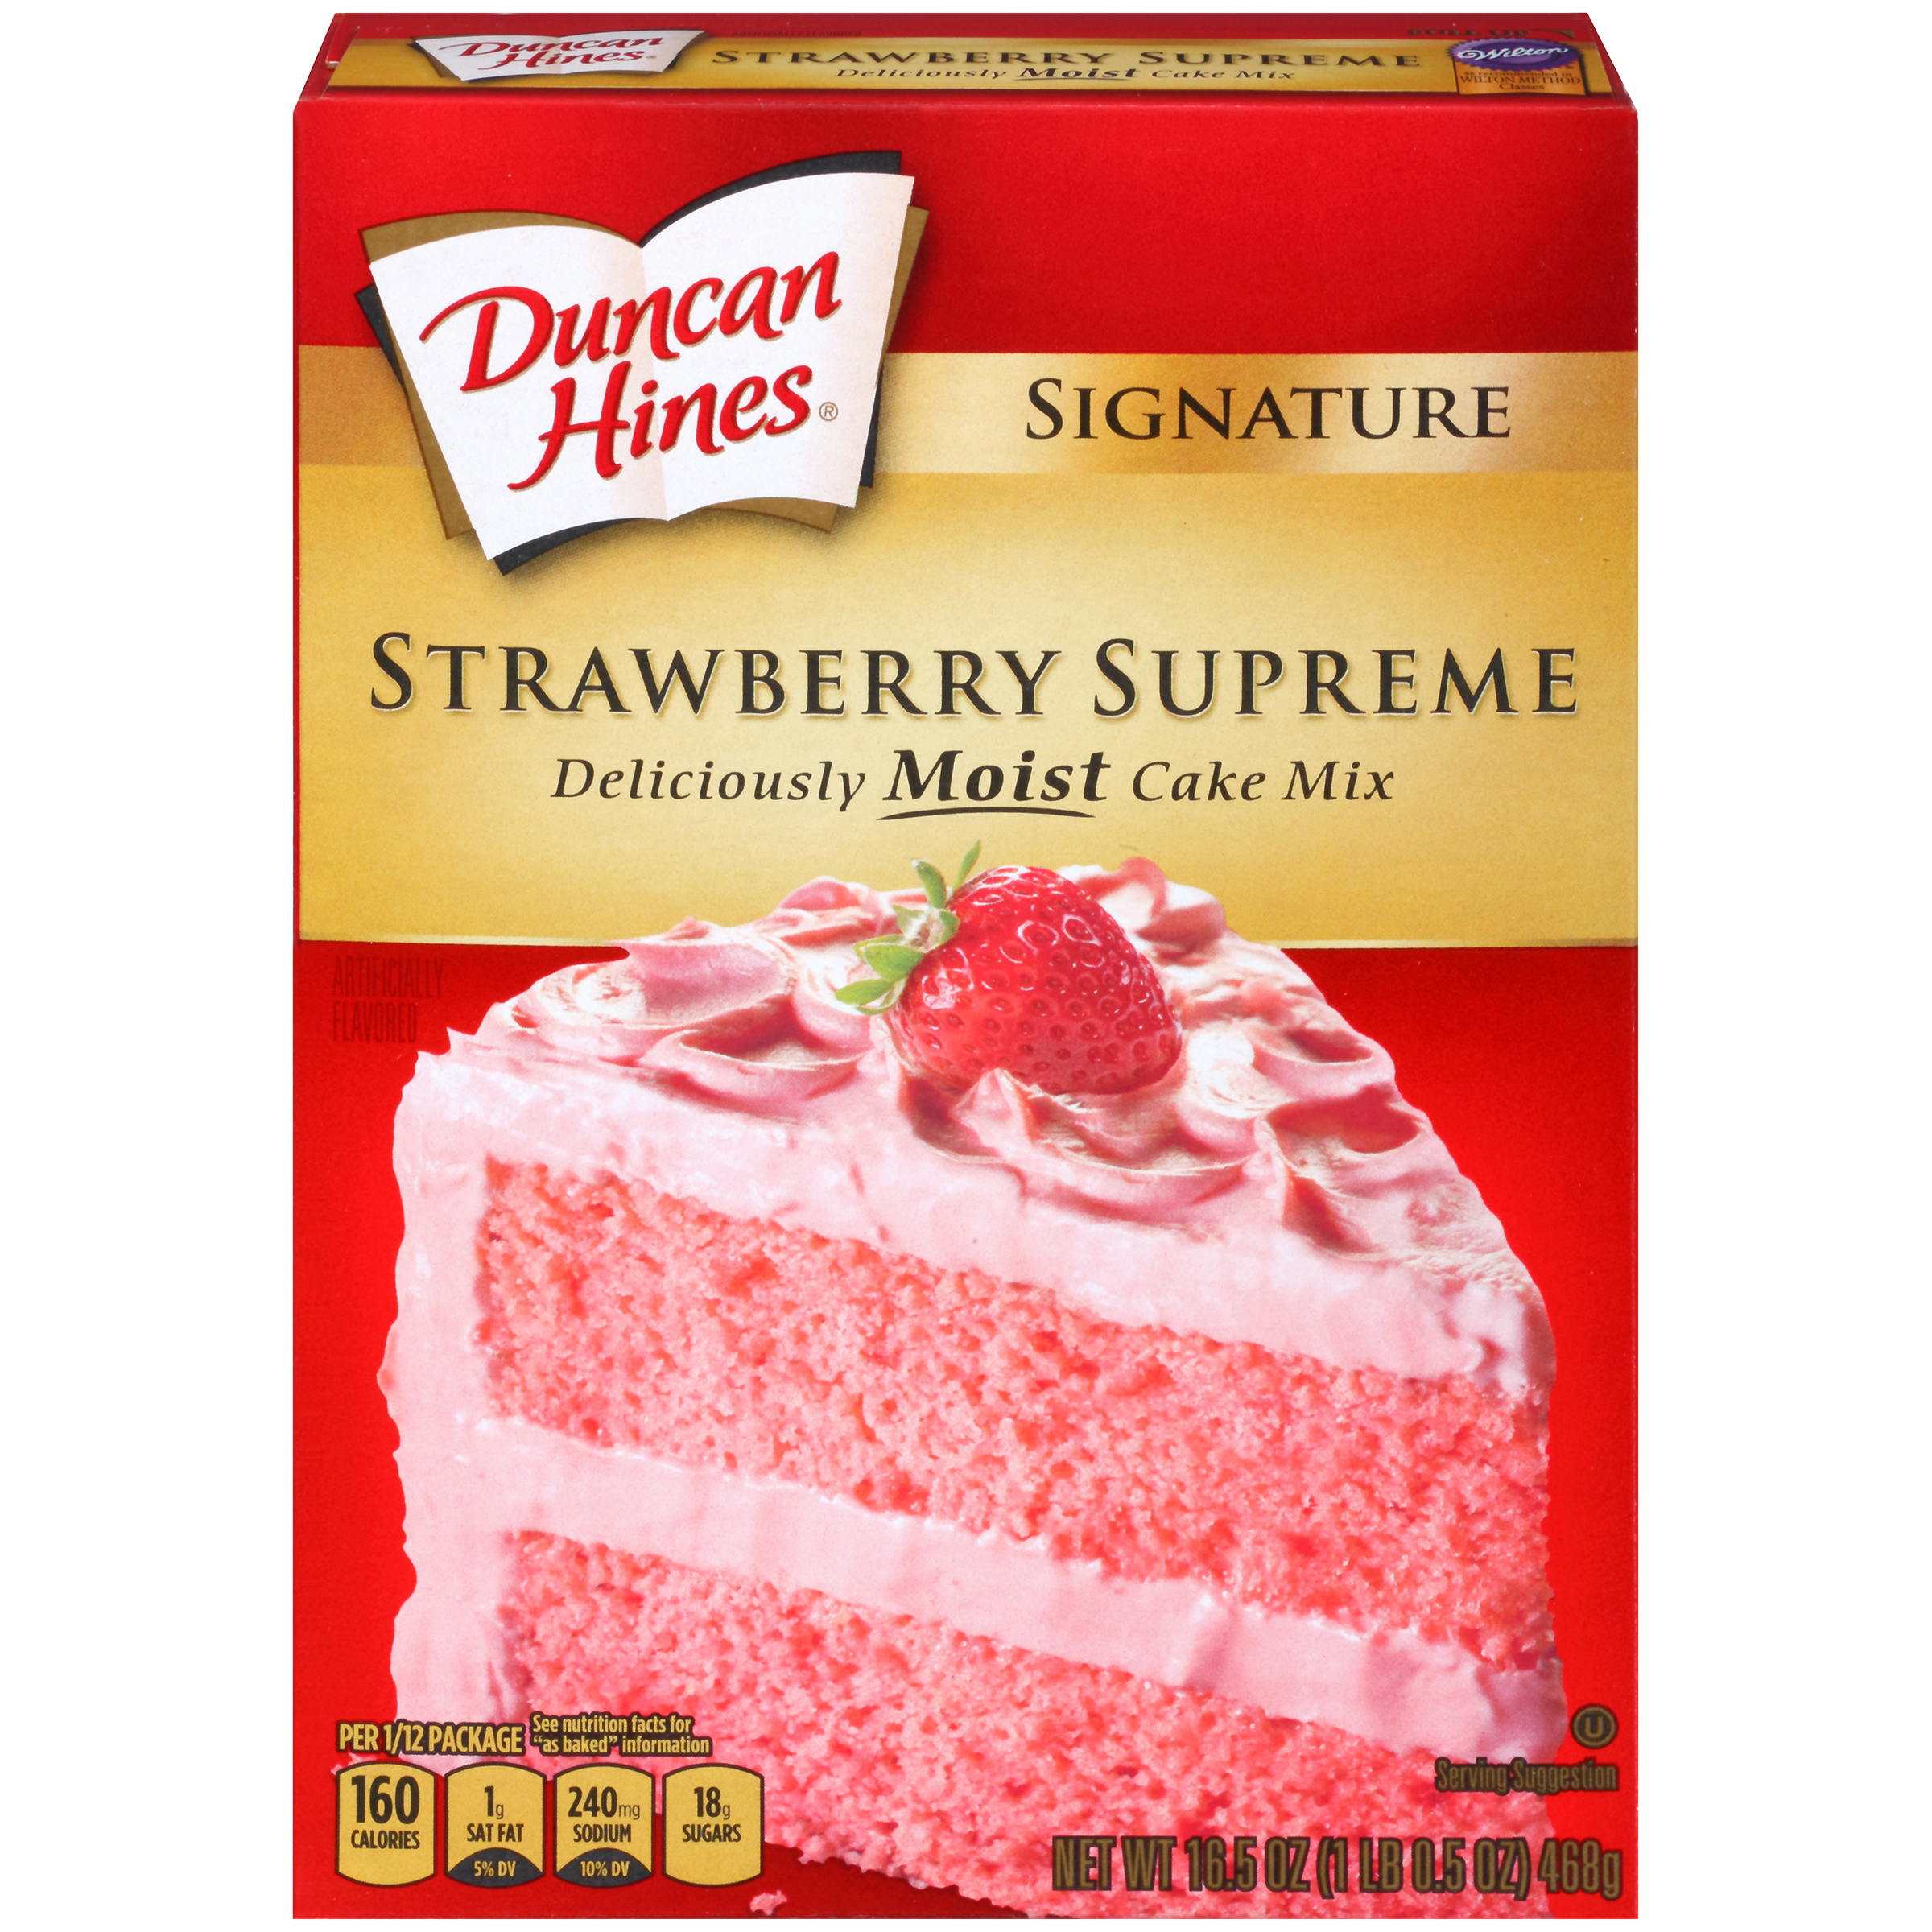 Duncan Hines Signature Strawberry Supreme Cake Mix Food